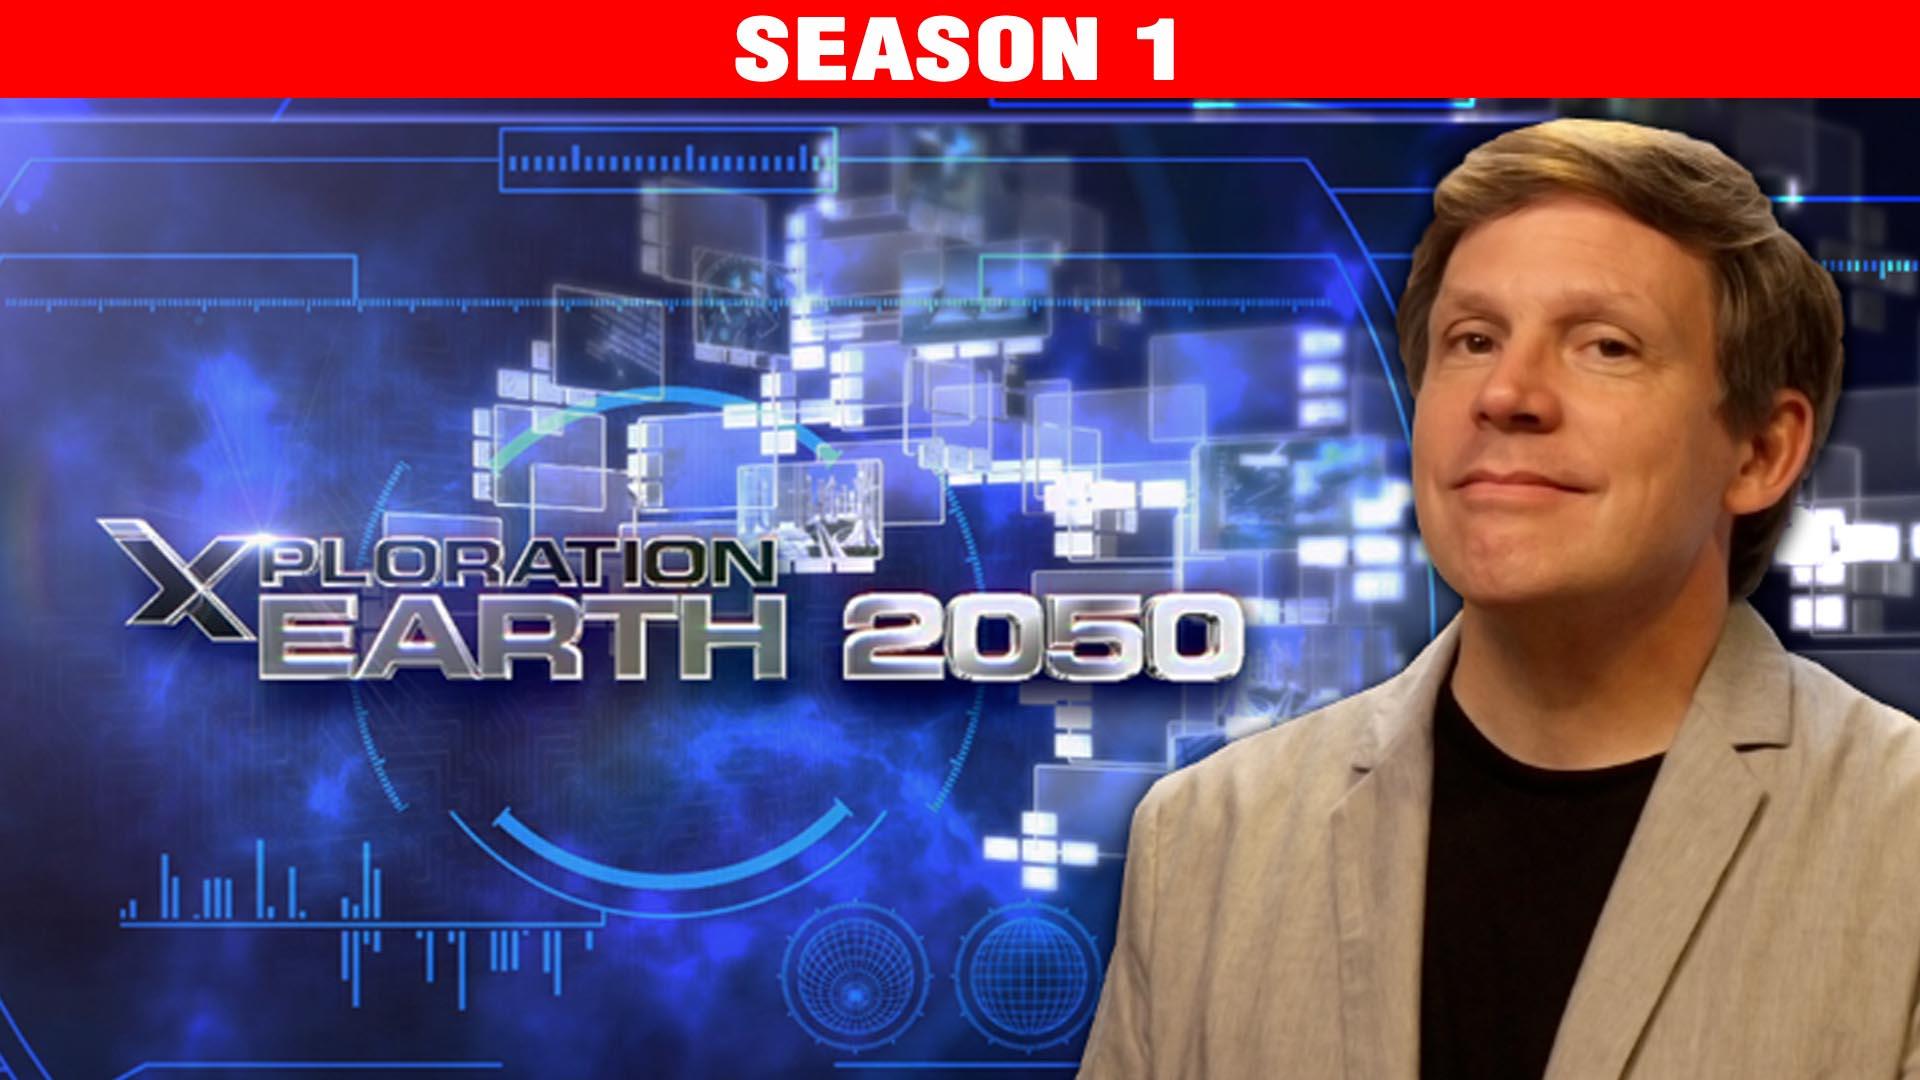 Xploration Earth 2050